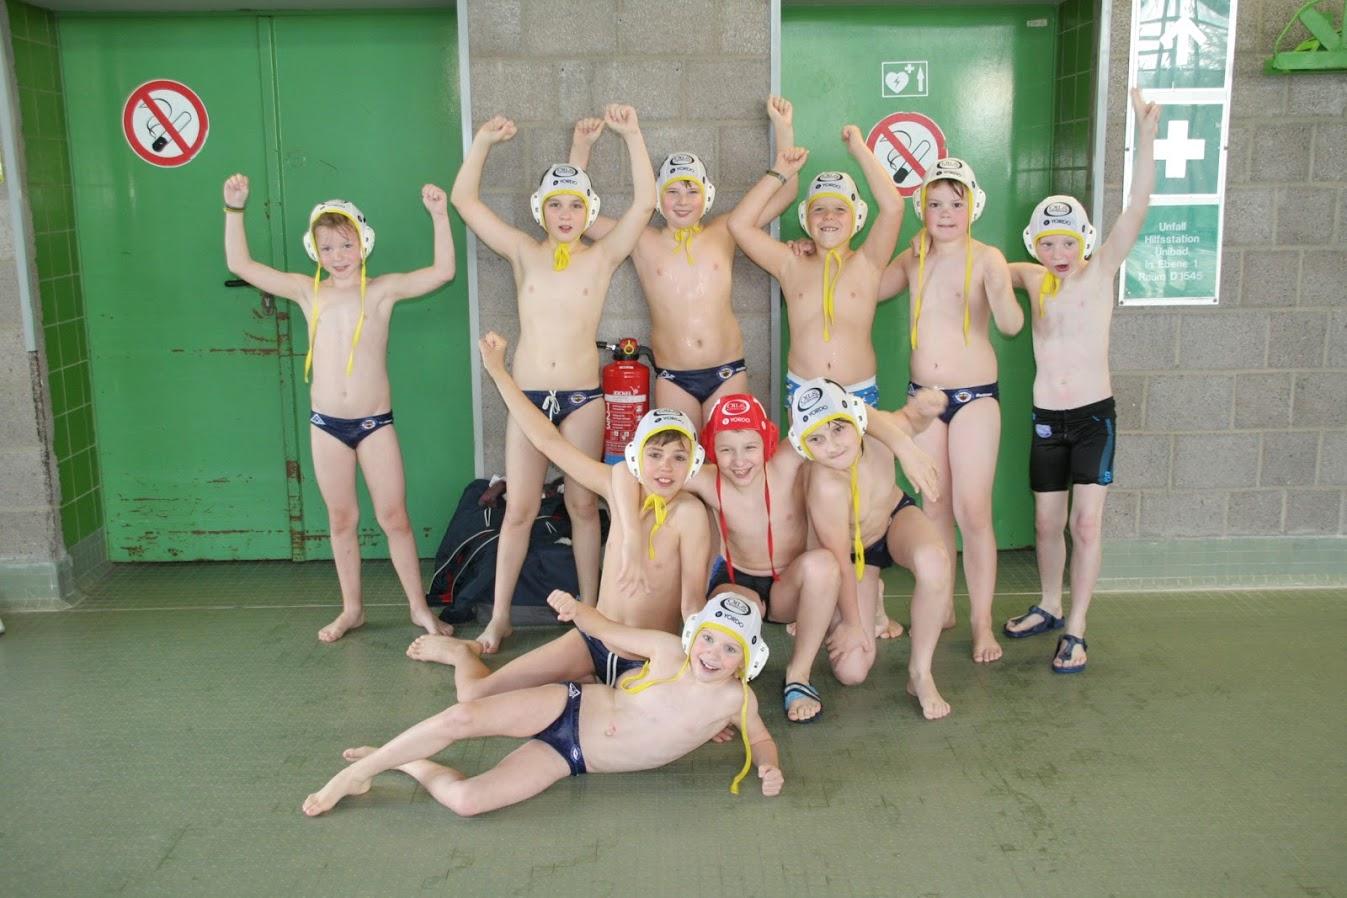 U10 Wasserballjugend Dominiert Mini-Liga